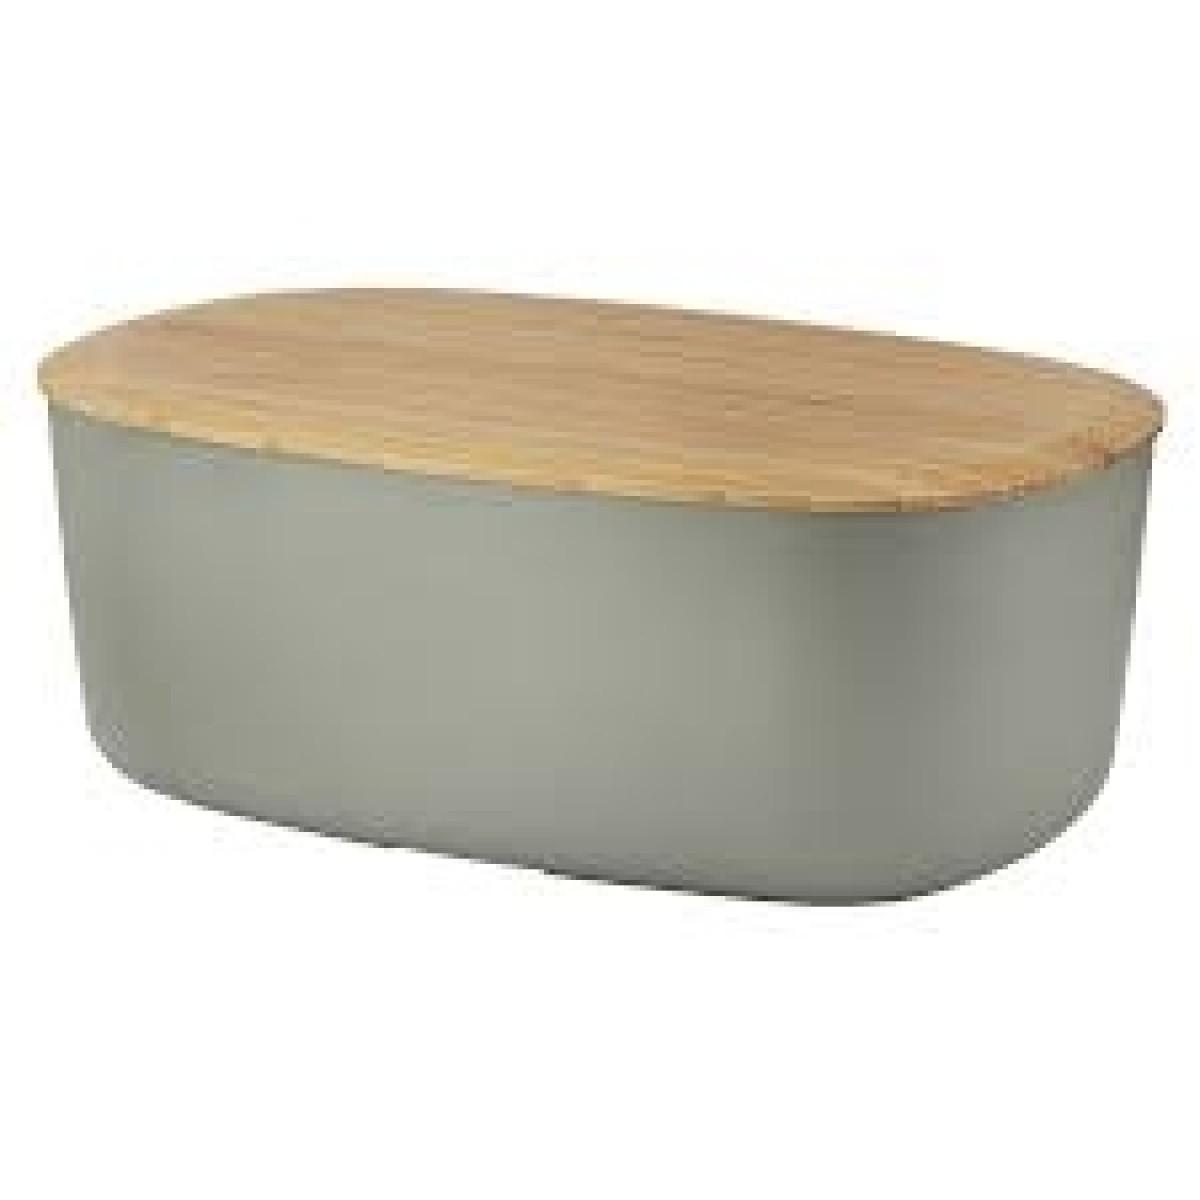 STELTON RIG-TIG Brødkasse box-it - grå